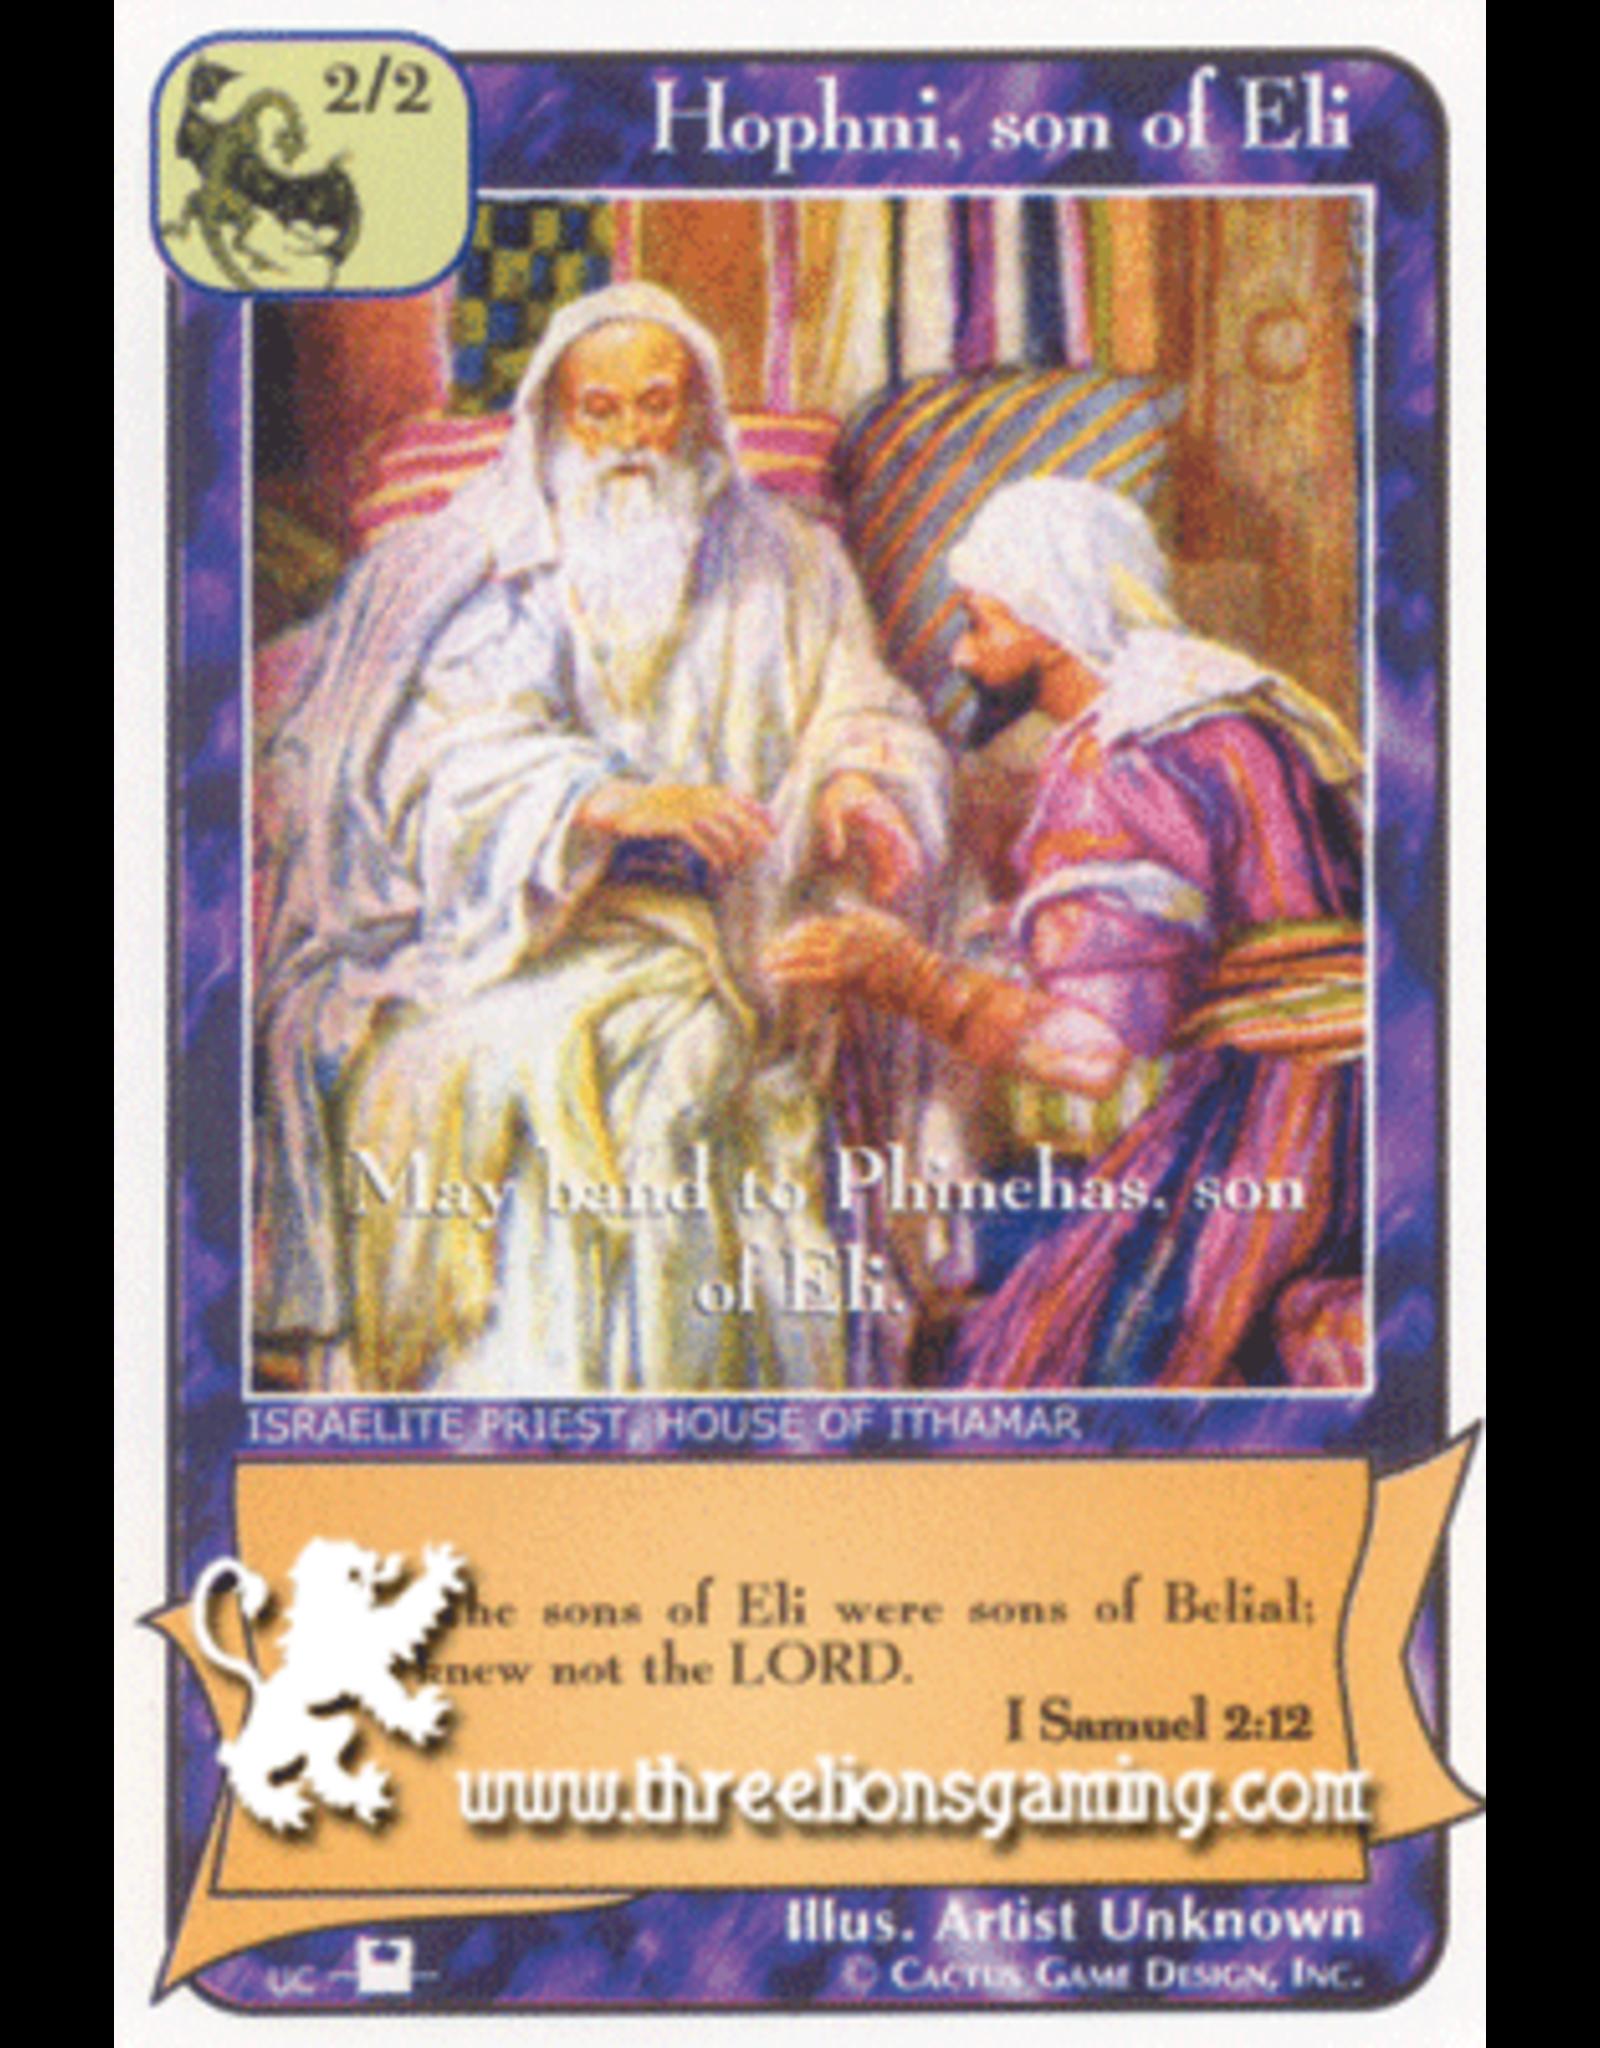 Priests: Hophni, son of Eli